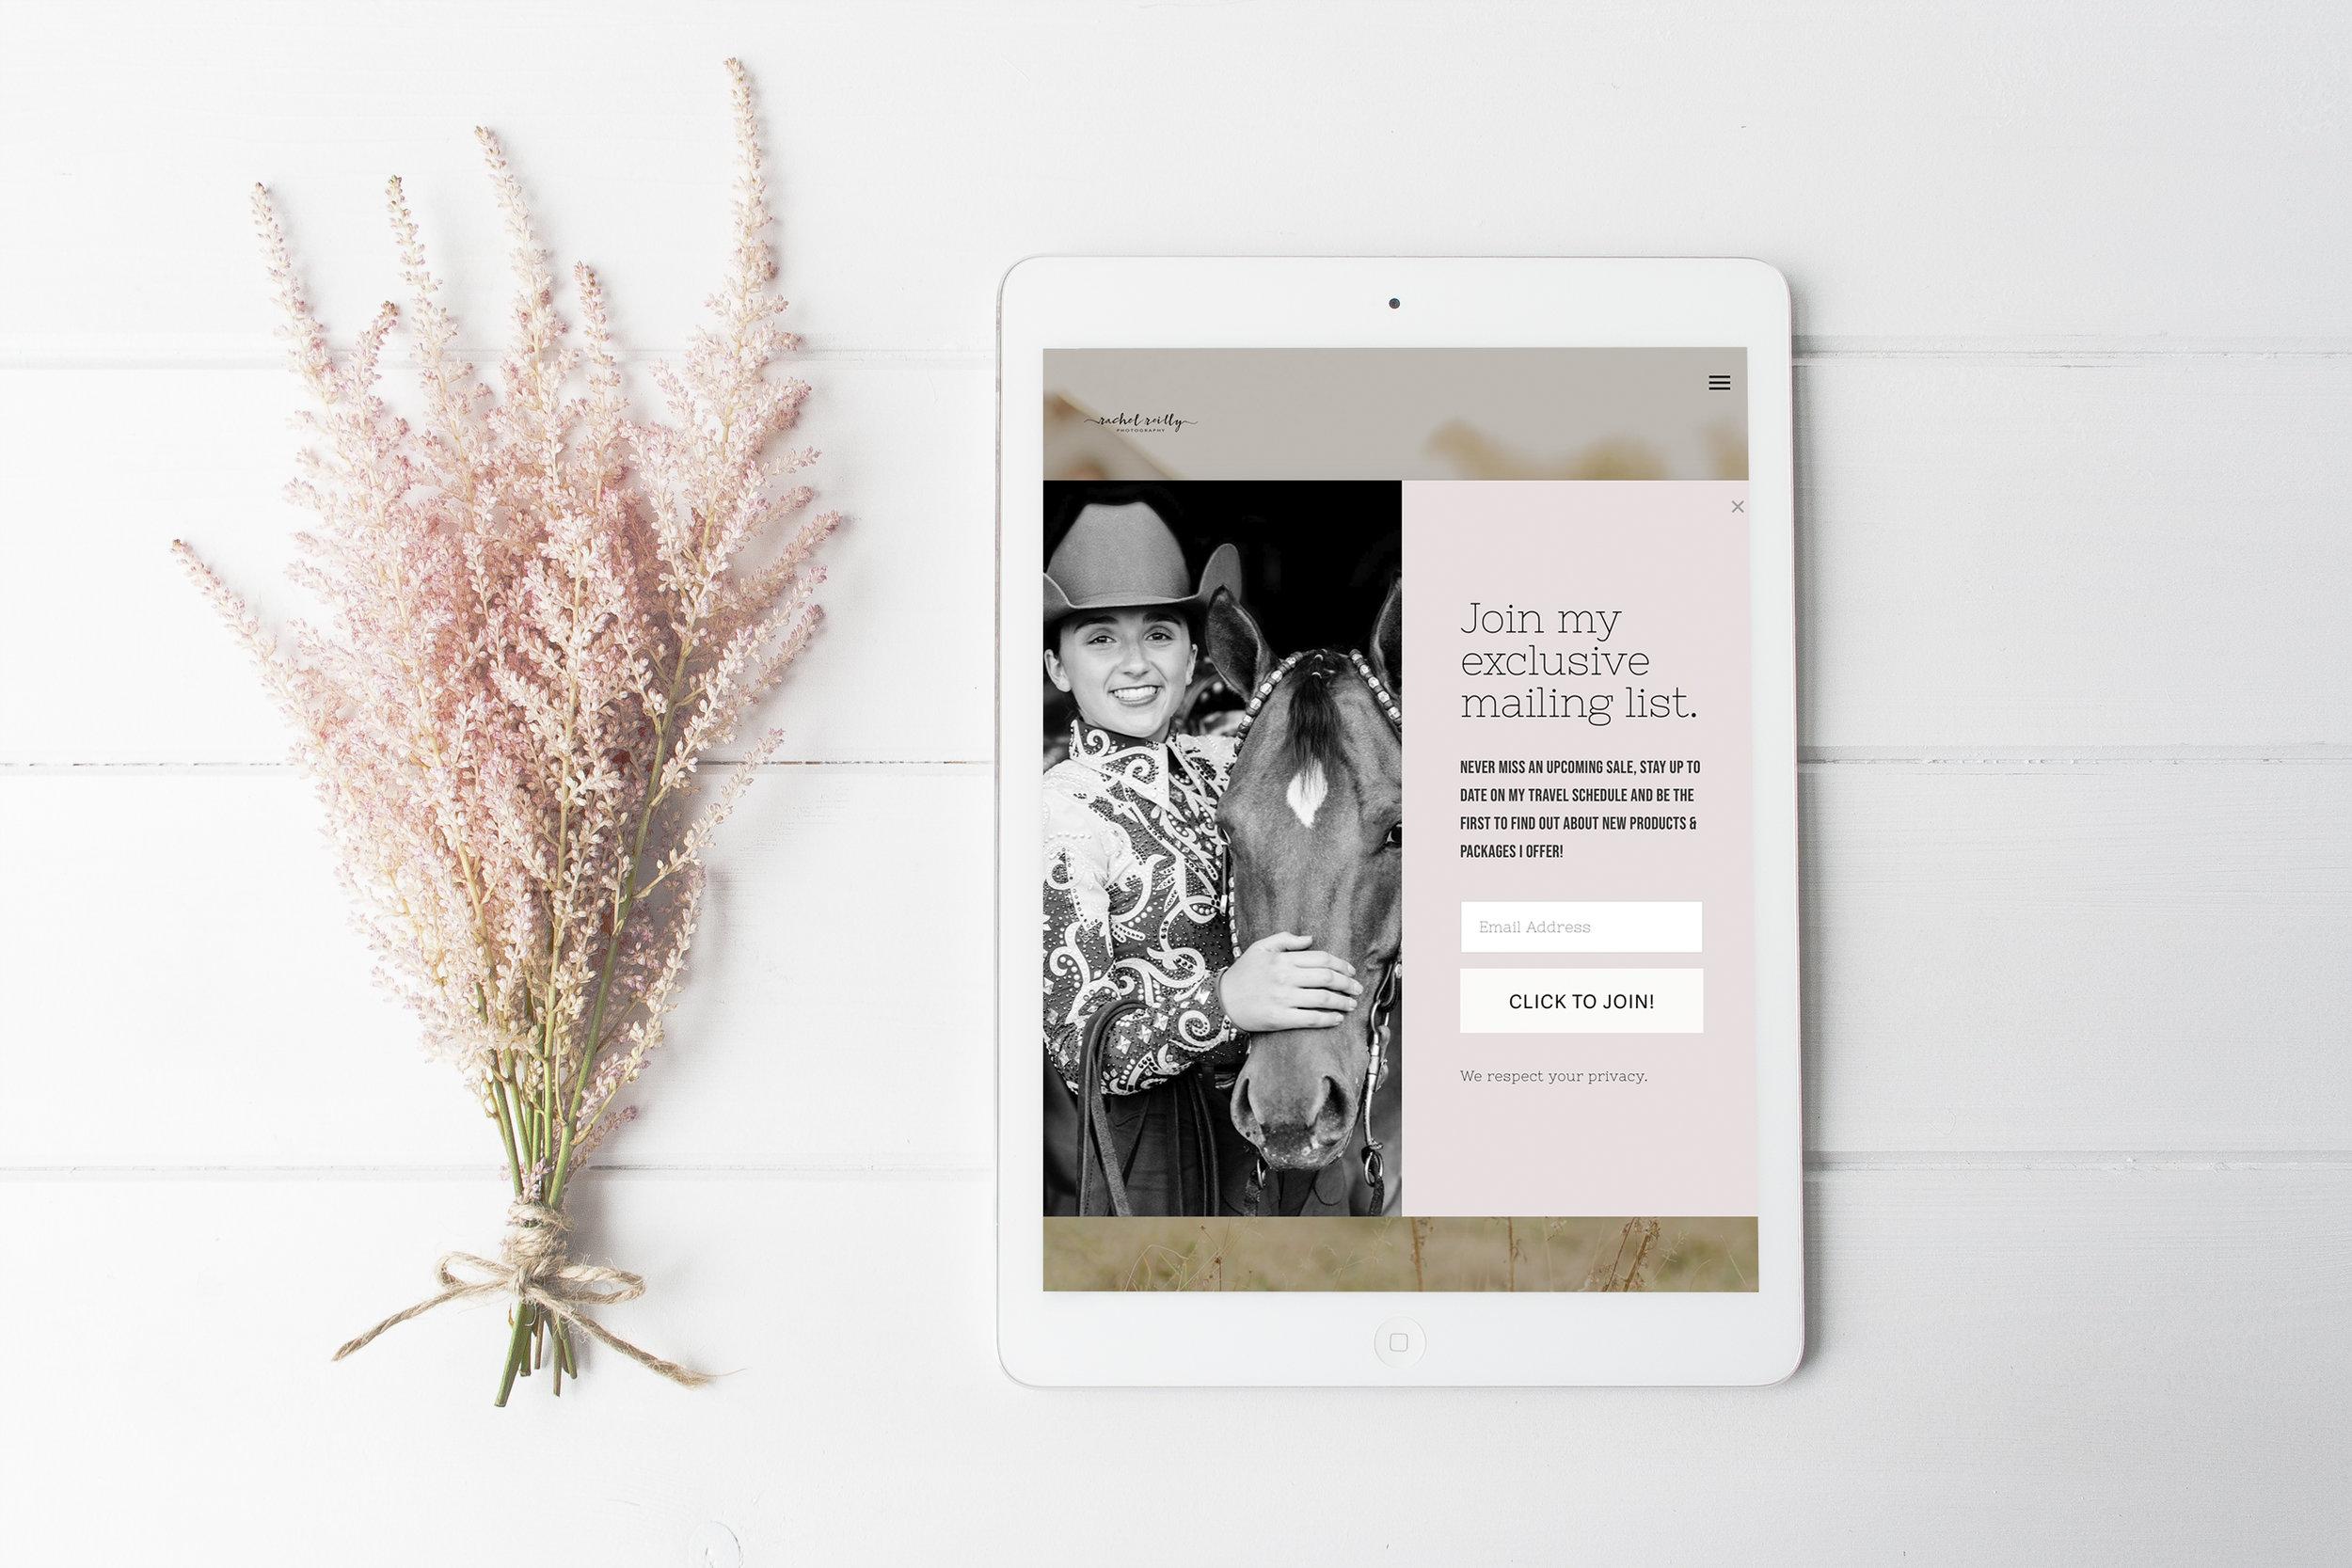 ETSY_310815_iPad.jpg